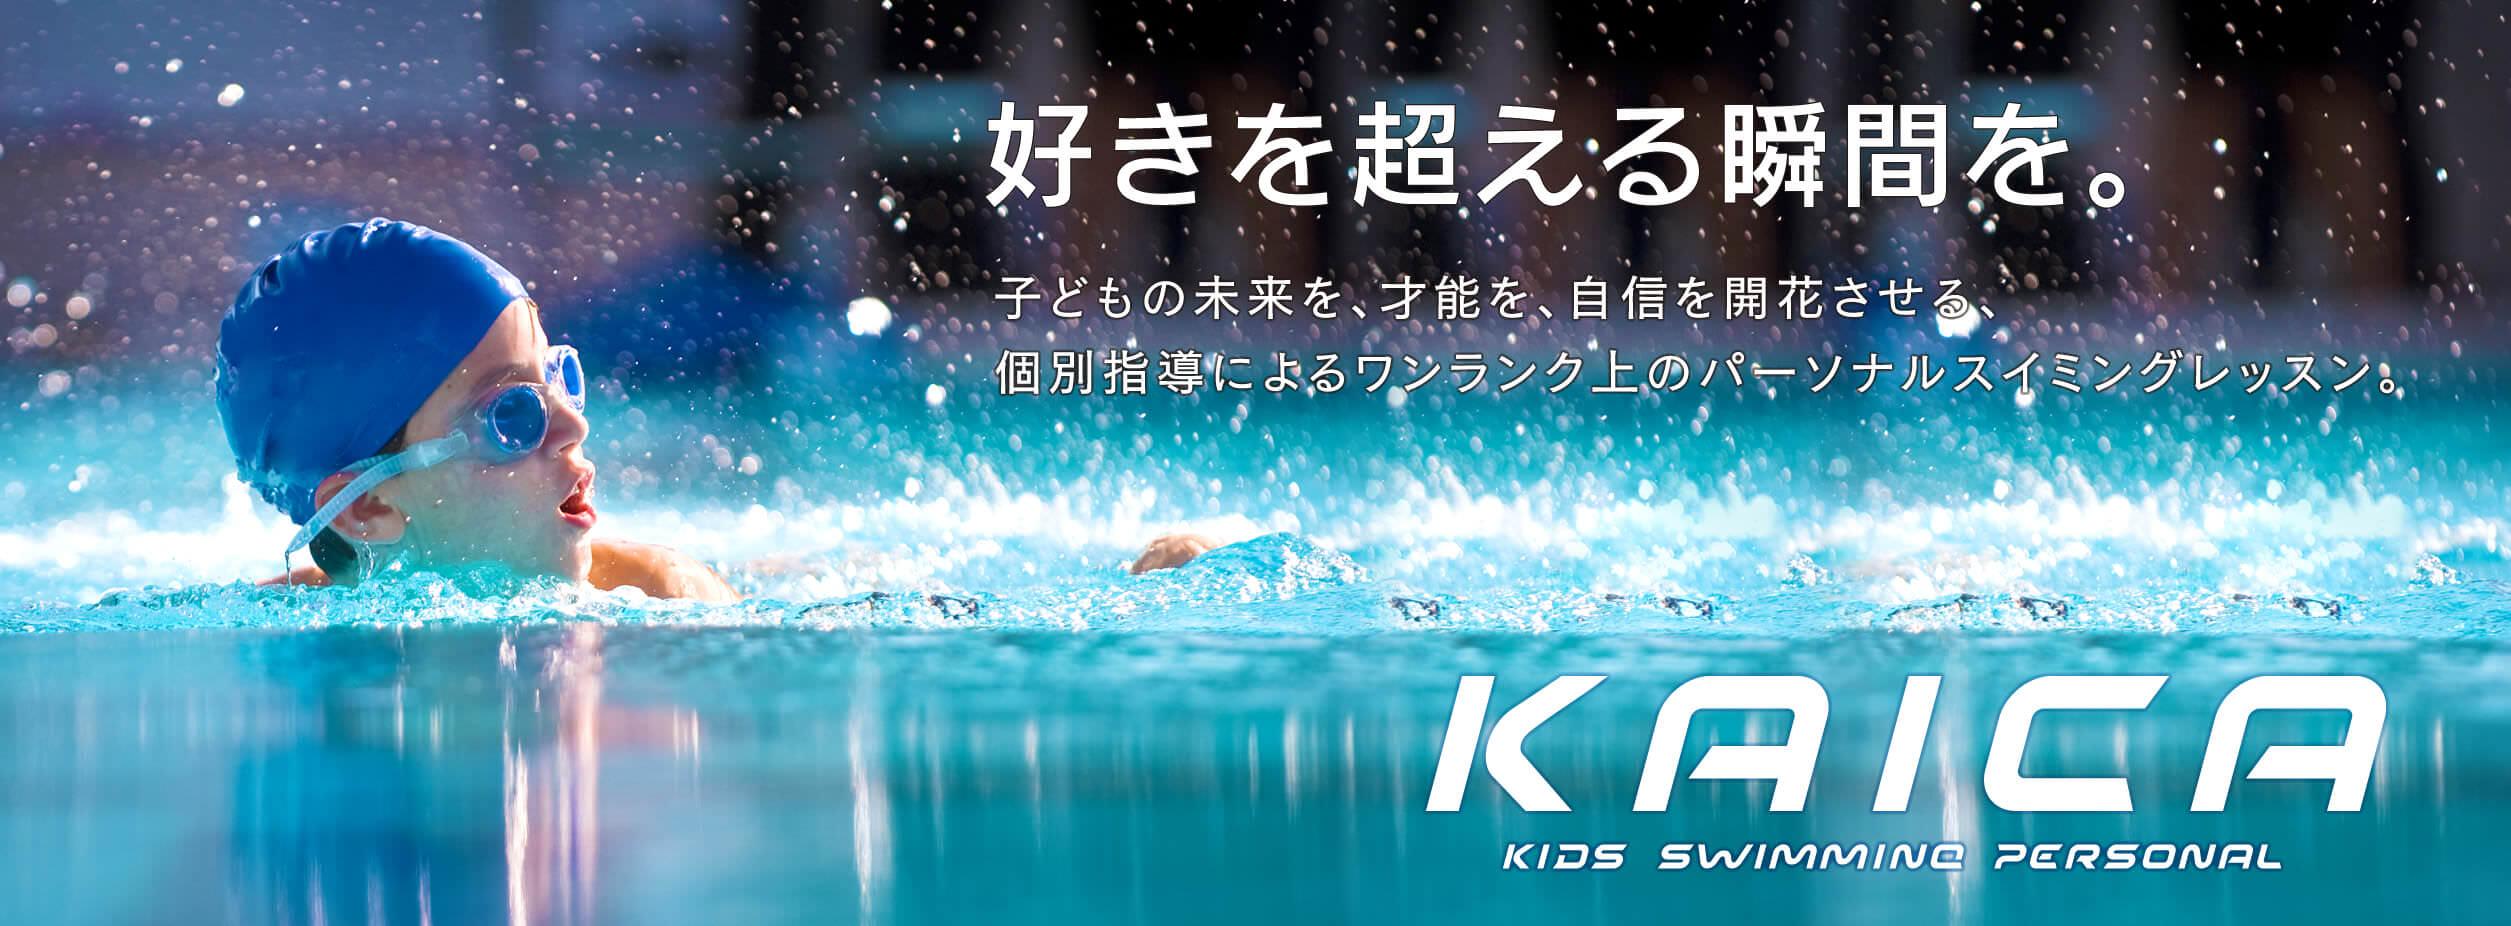 KAICA(キッズスイミングパーソナル)